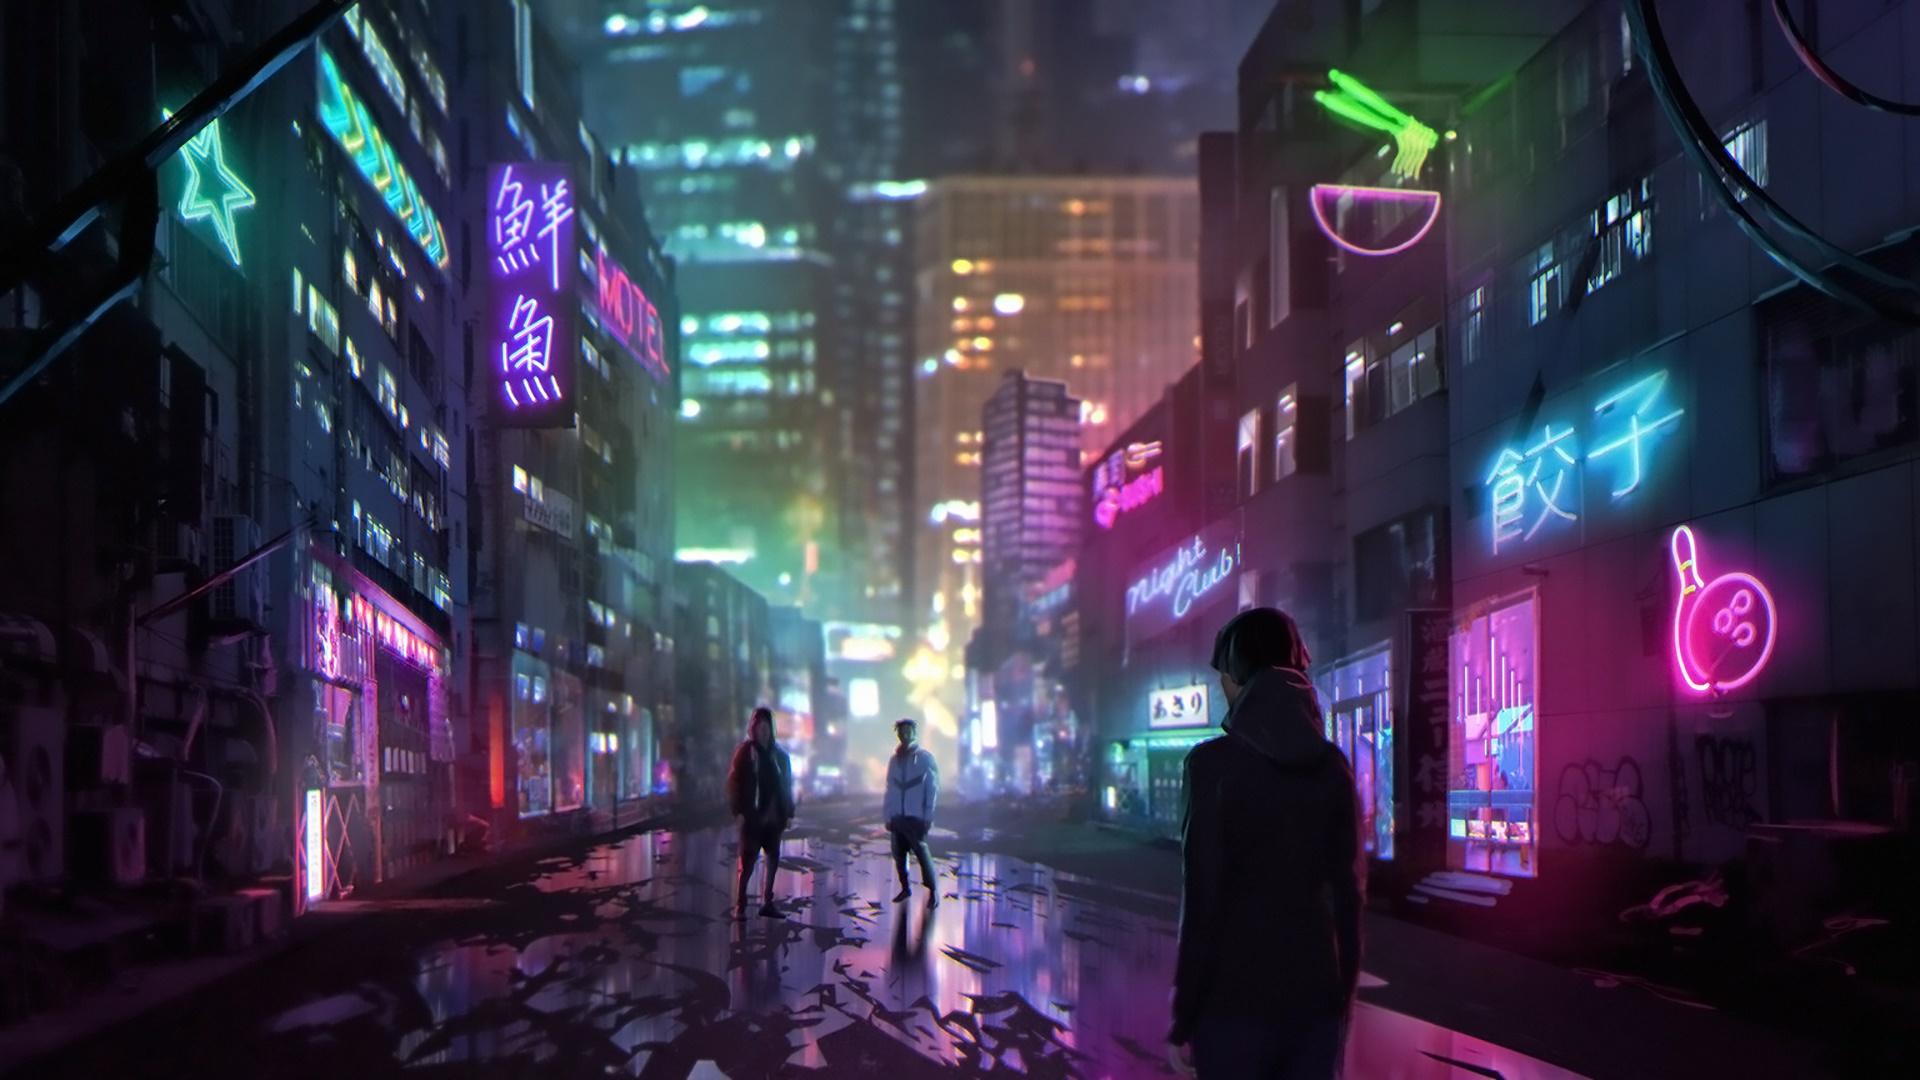 Futuristic cyberpunk anime city wallpaper